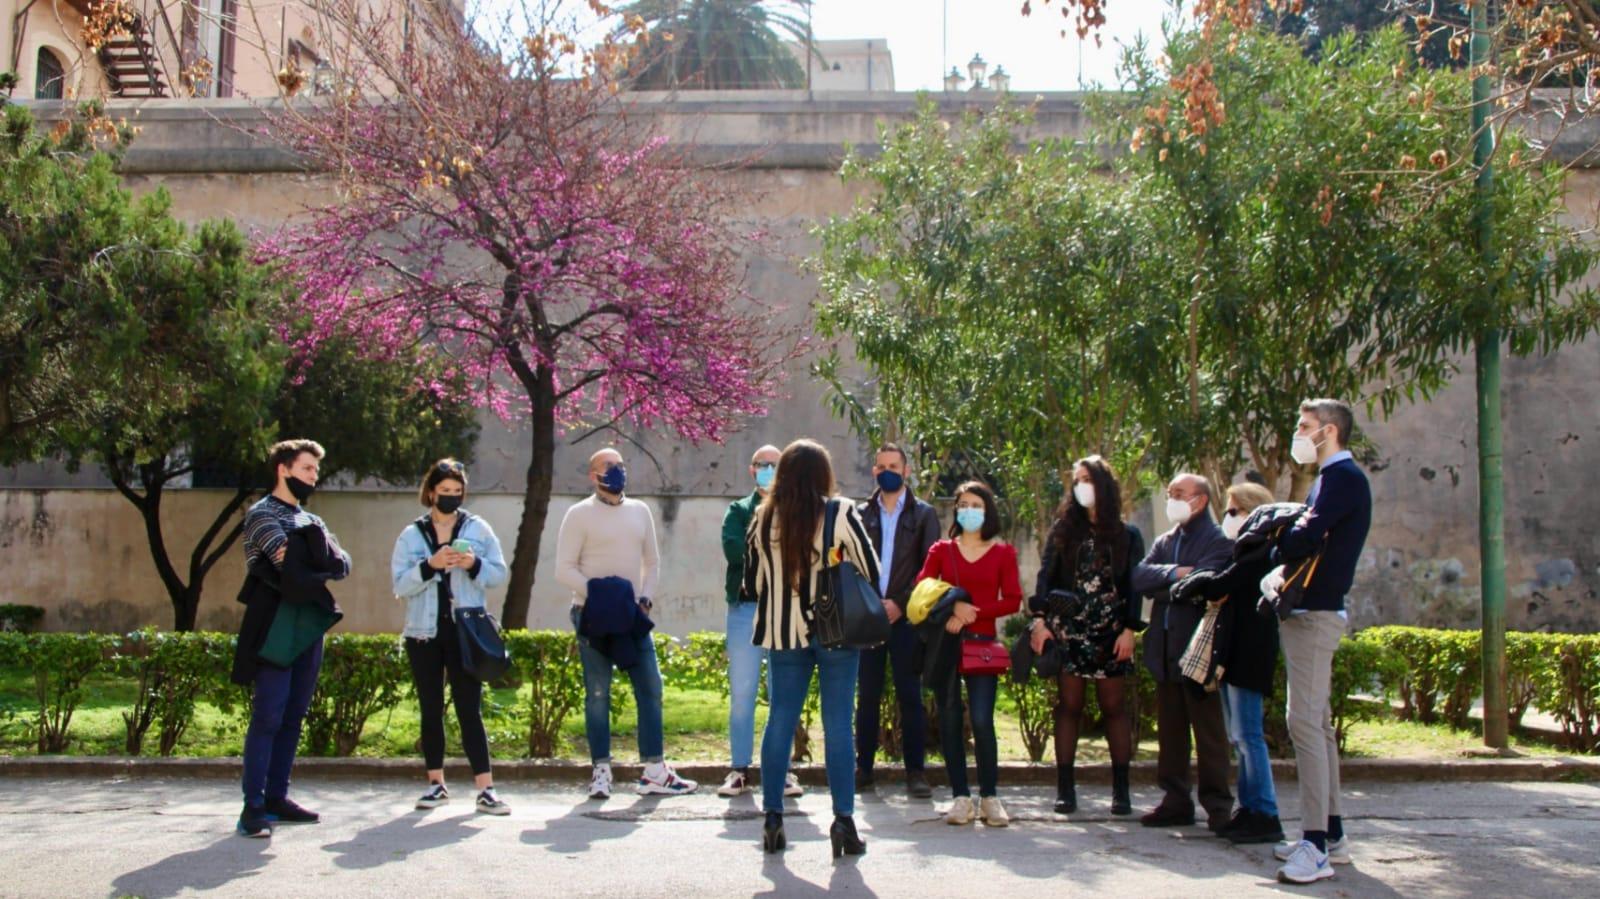 CityWalk - Historic Palermo 6